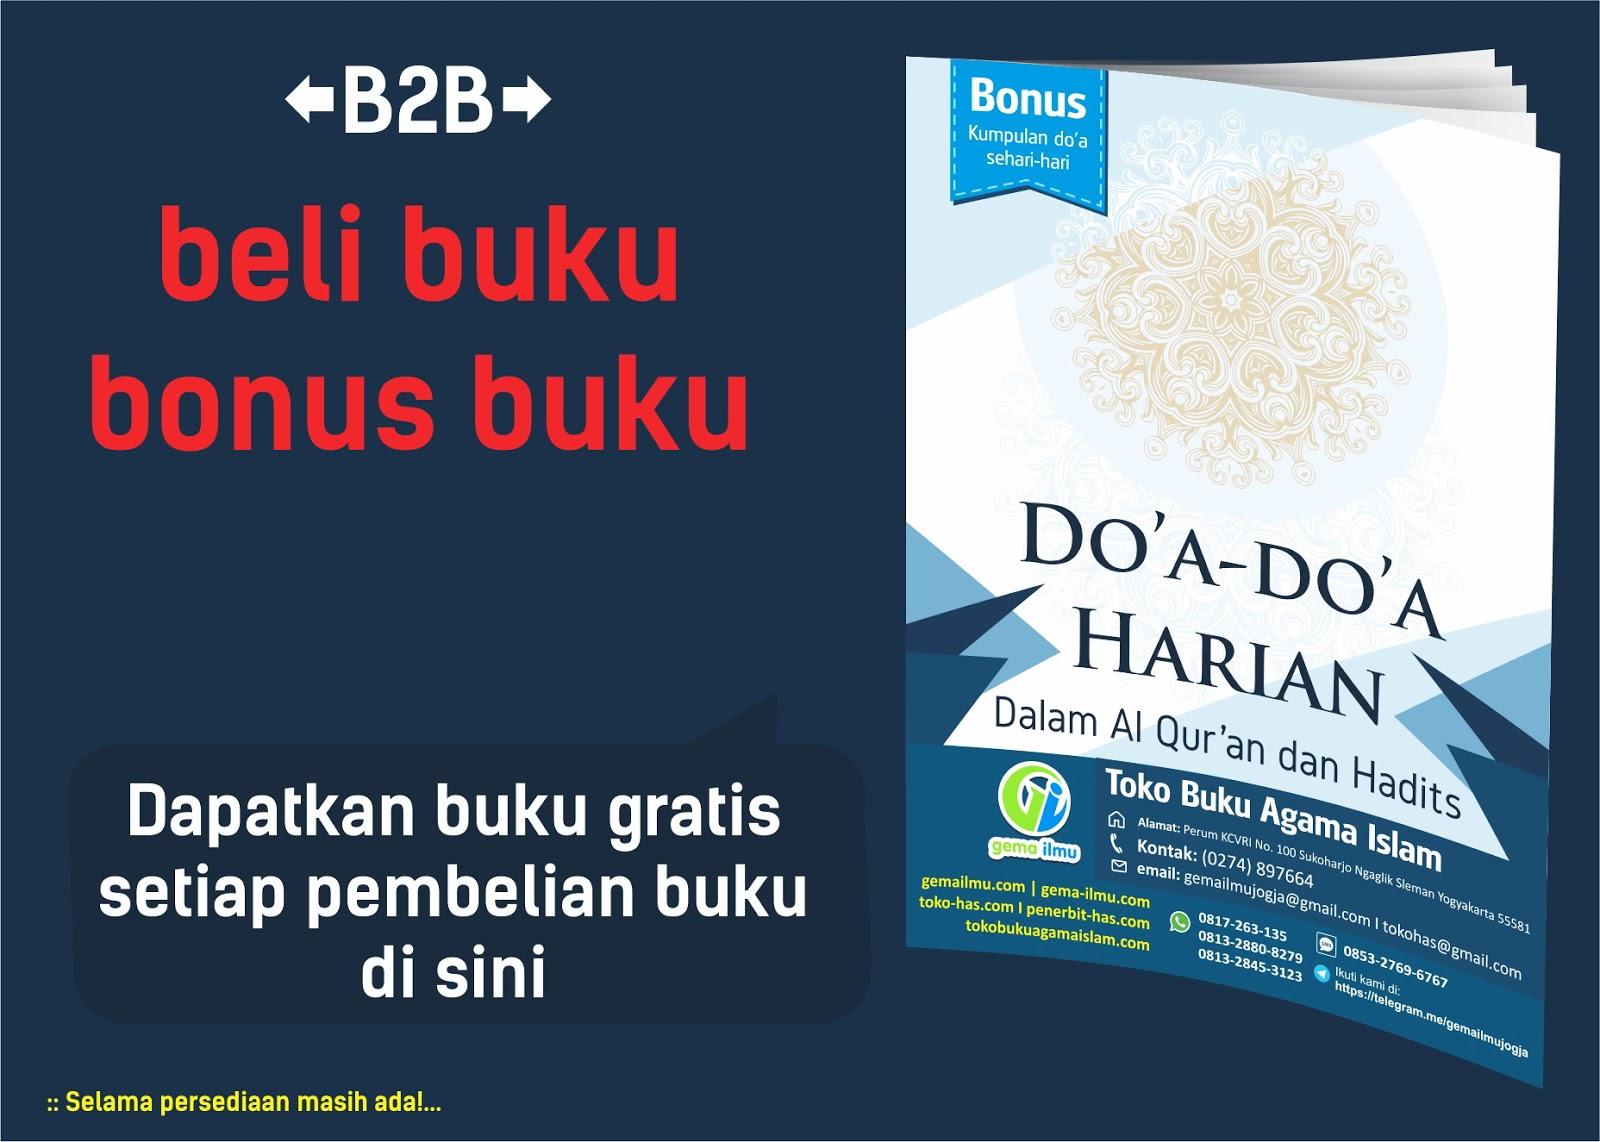 Toko Buku Agama Islam Online